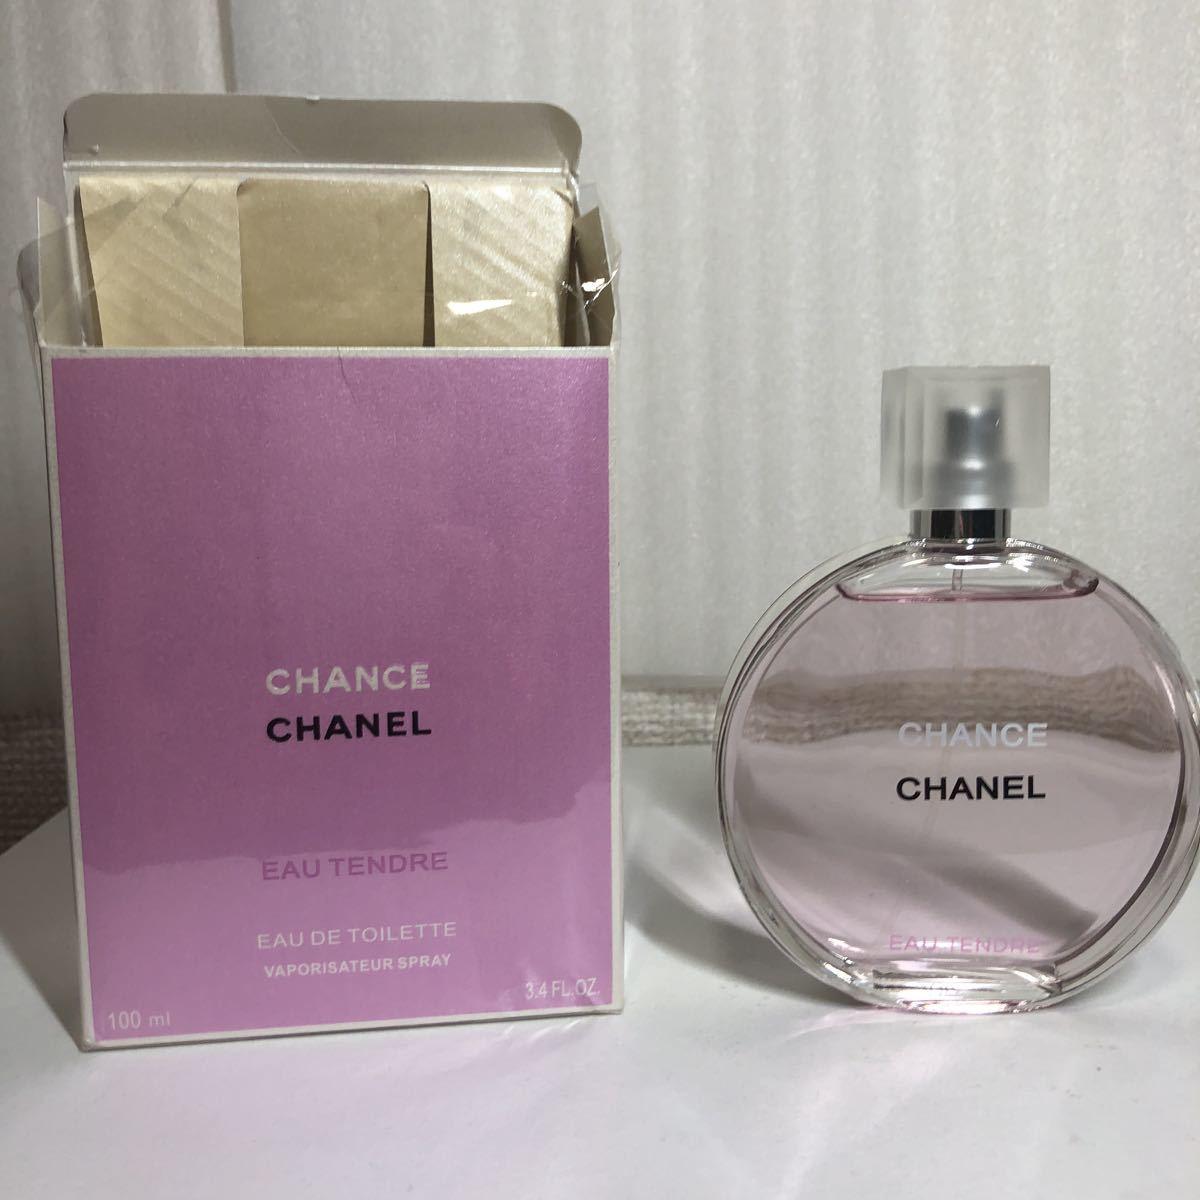 【CHANEL】シャネル チャンス オータンドゥル 100ml CHANEL CHANCE EAU TENDRE 100ml